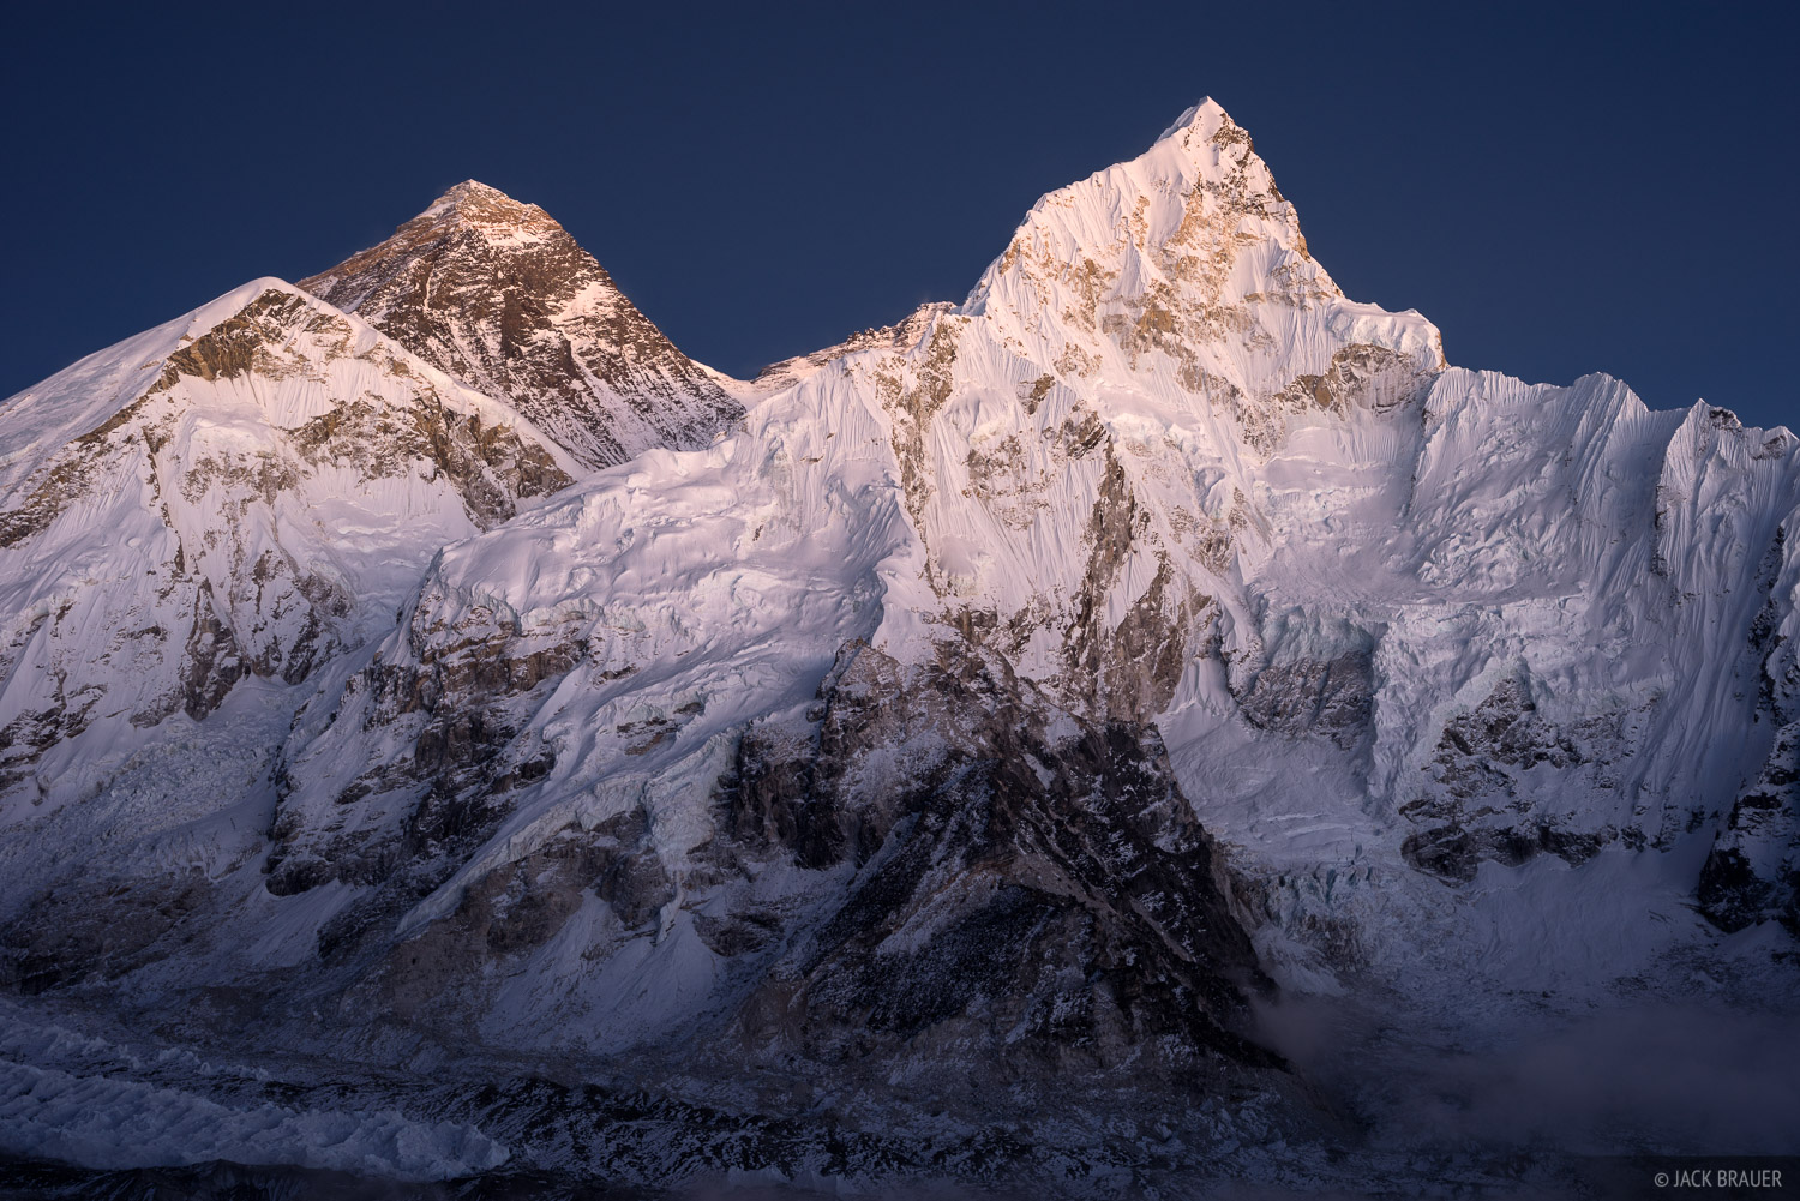 Himalaya,Kala Patthar,Khumbu,Mt. Everest,Nepal,Nuptse, photo